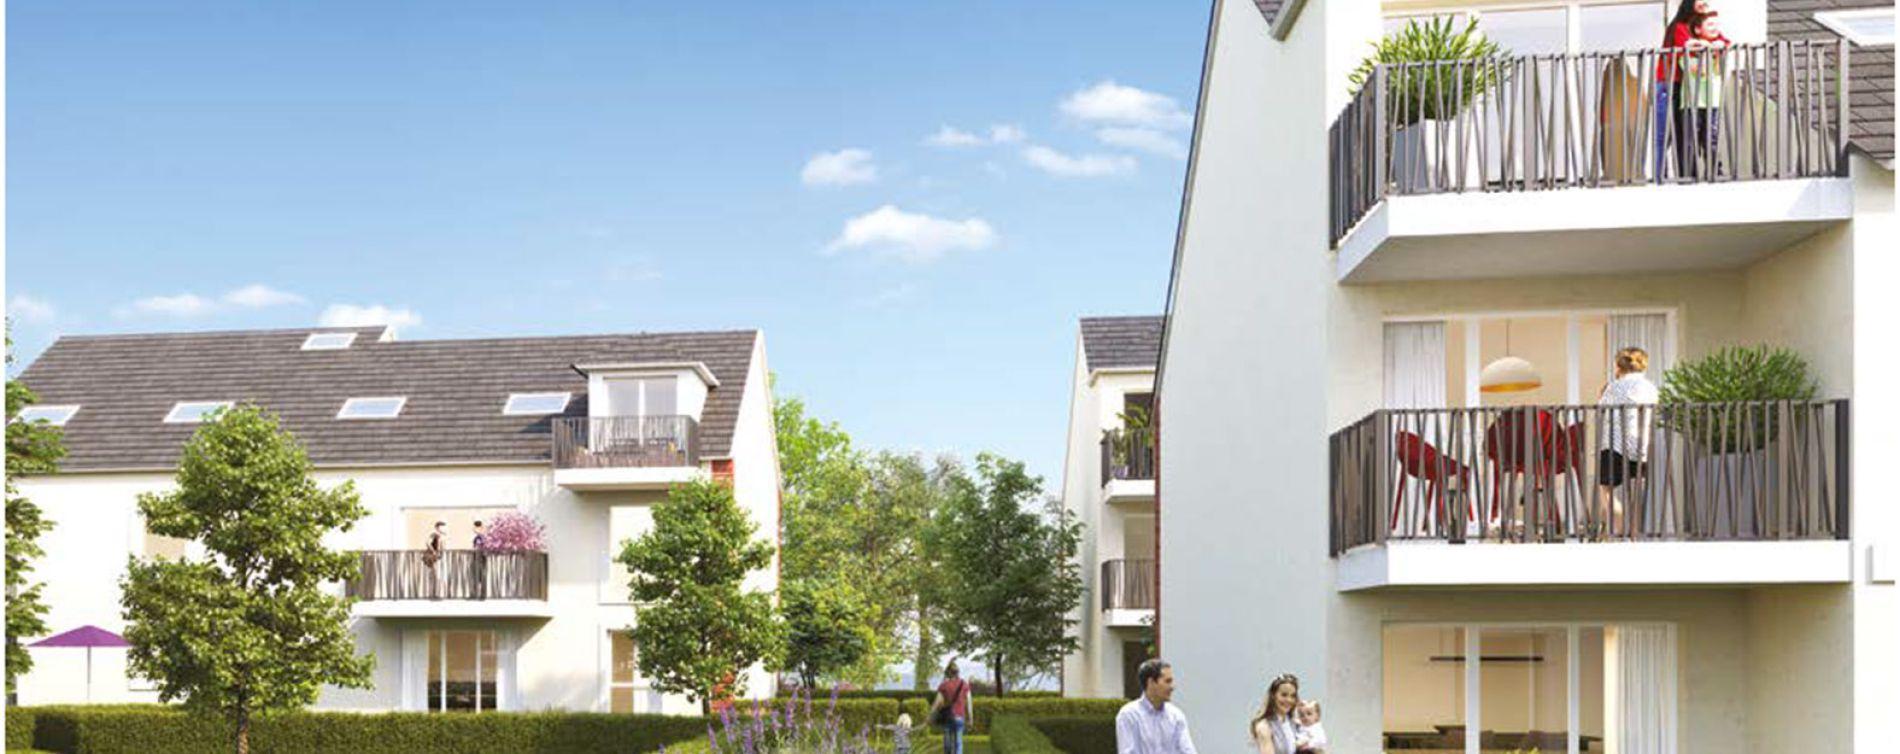 Chevry-Cossigny : programme immobilier neuve « Le Domaine des Arts »